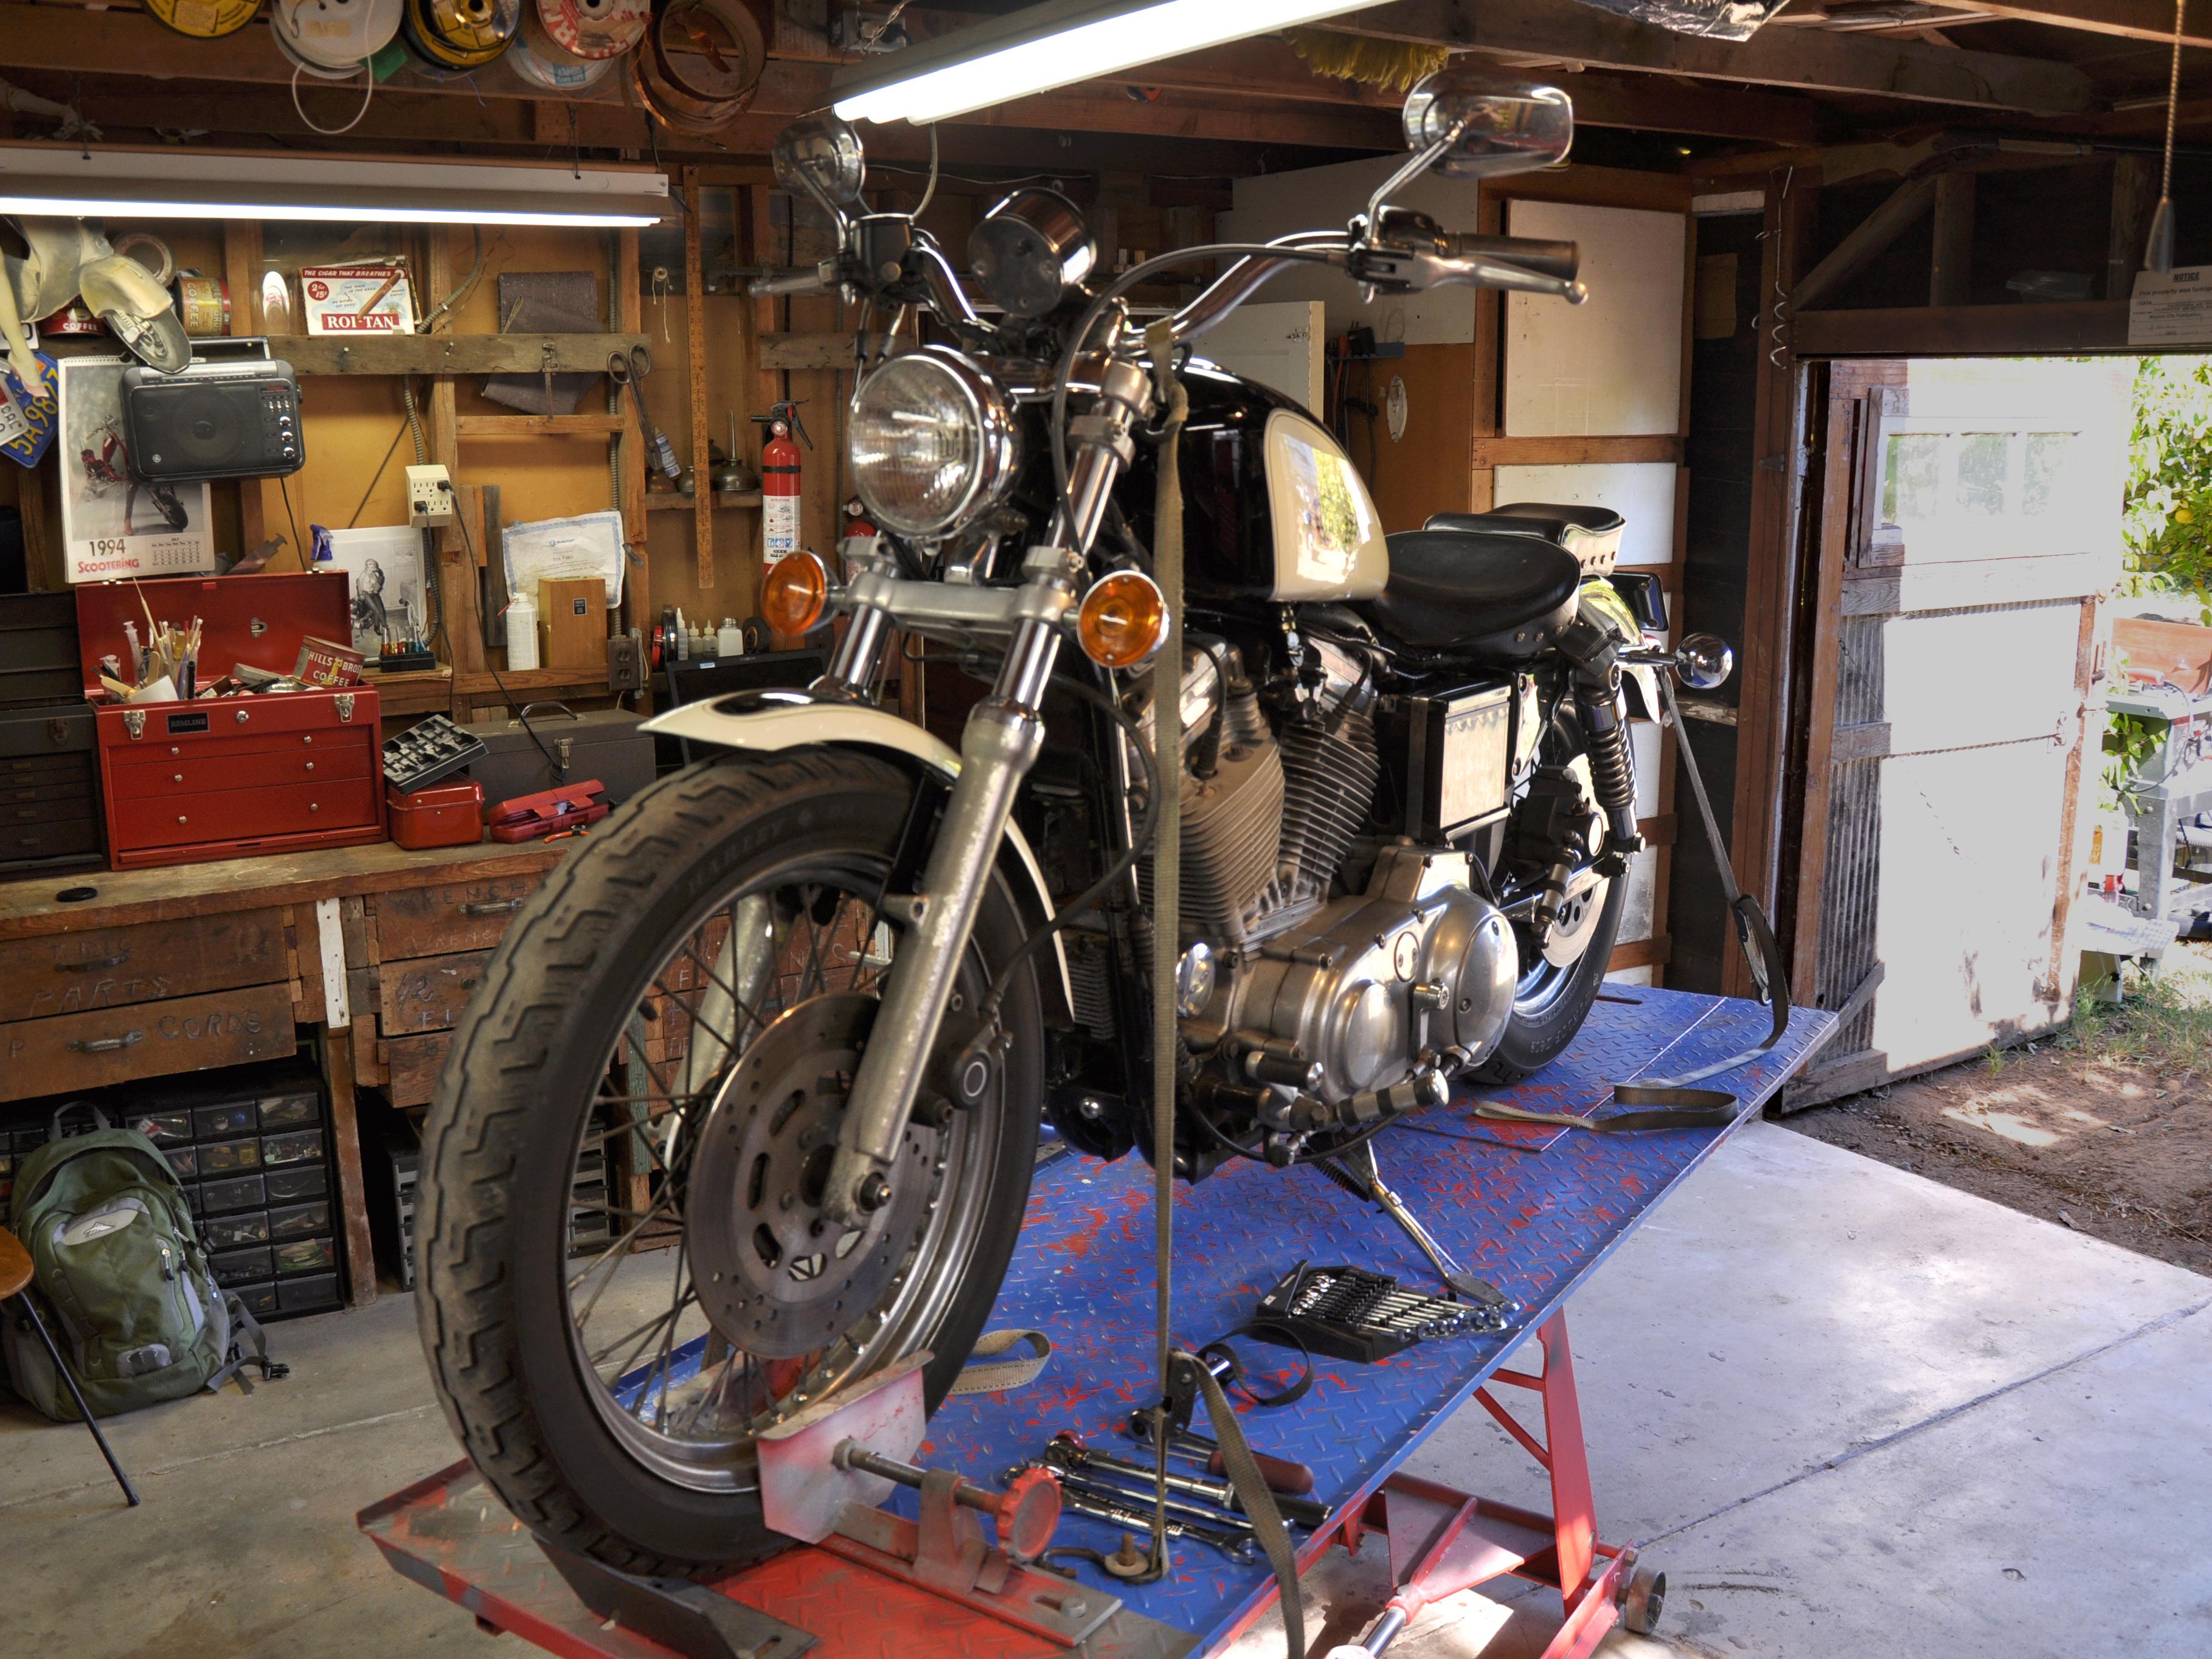 1996 Harley Dyna Wiring Diagram Harley Davidson Sportster Evolution Oil Change Ifixit